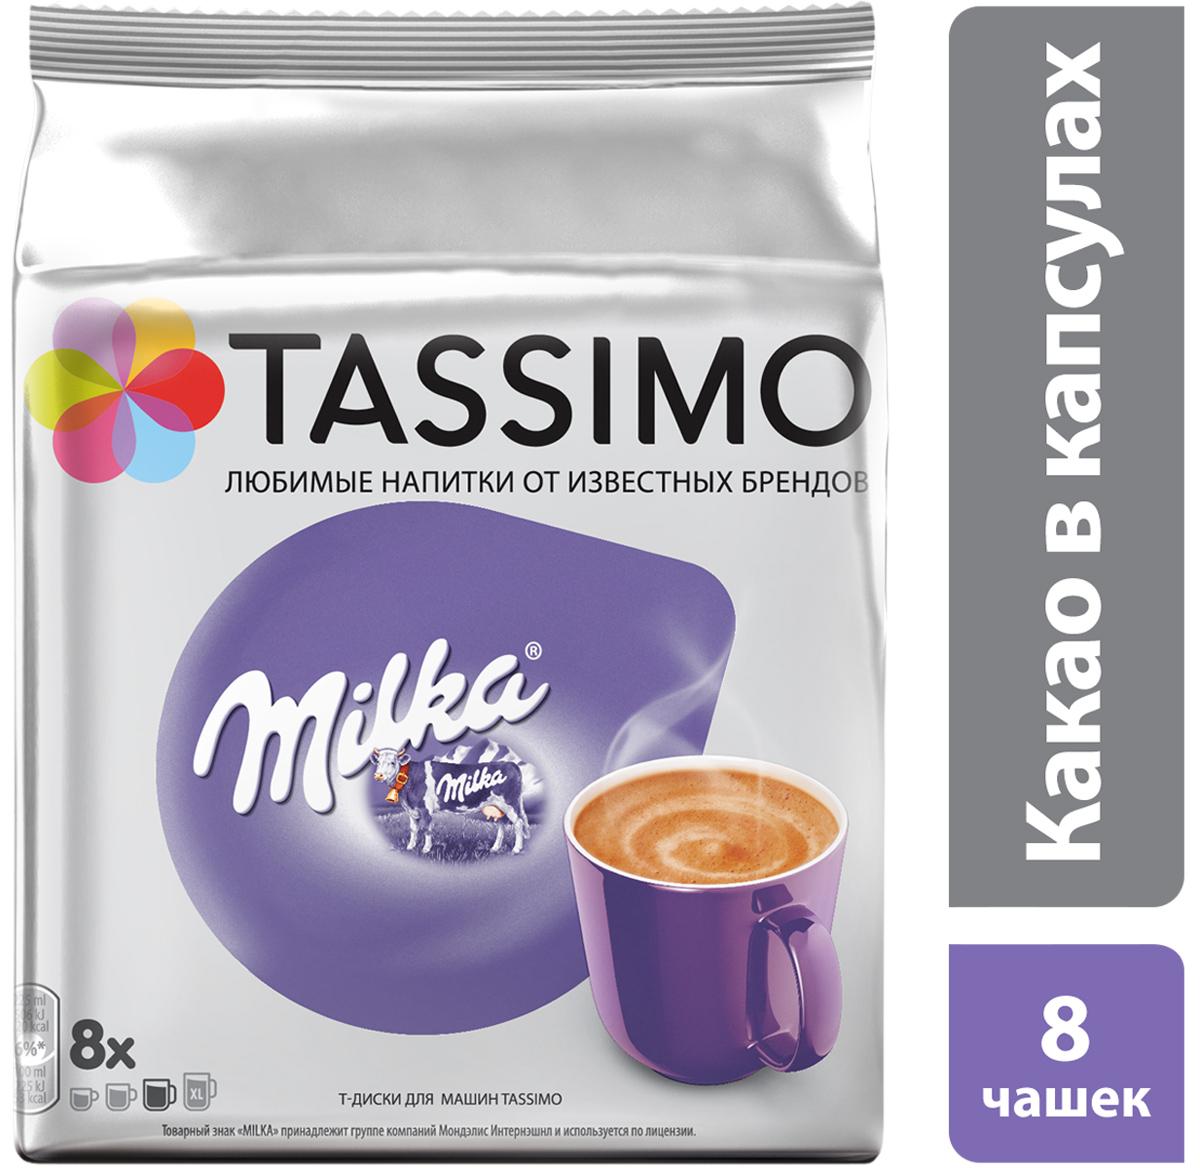 Tassimo Milka какао в капсулах, 8 шт капсулы т диски tassimo jacobs americano 16 порций